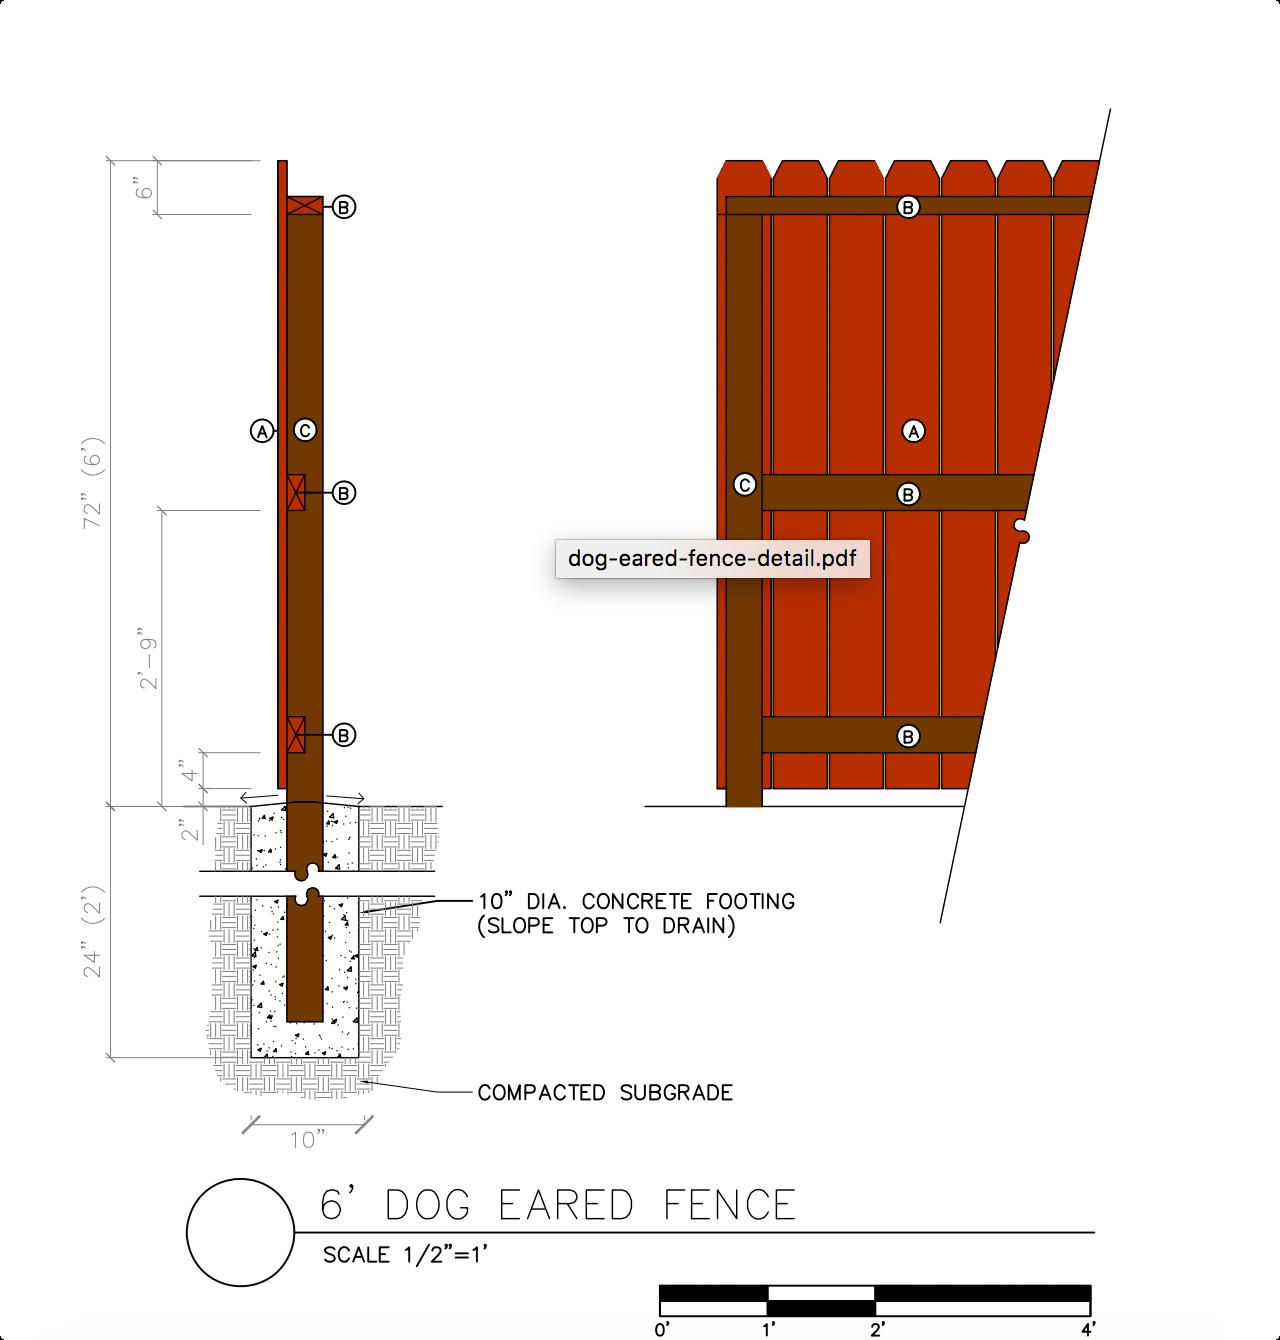 6' Dog Eared Fence